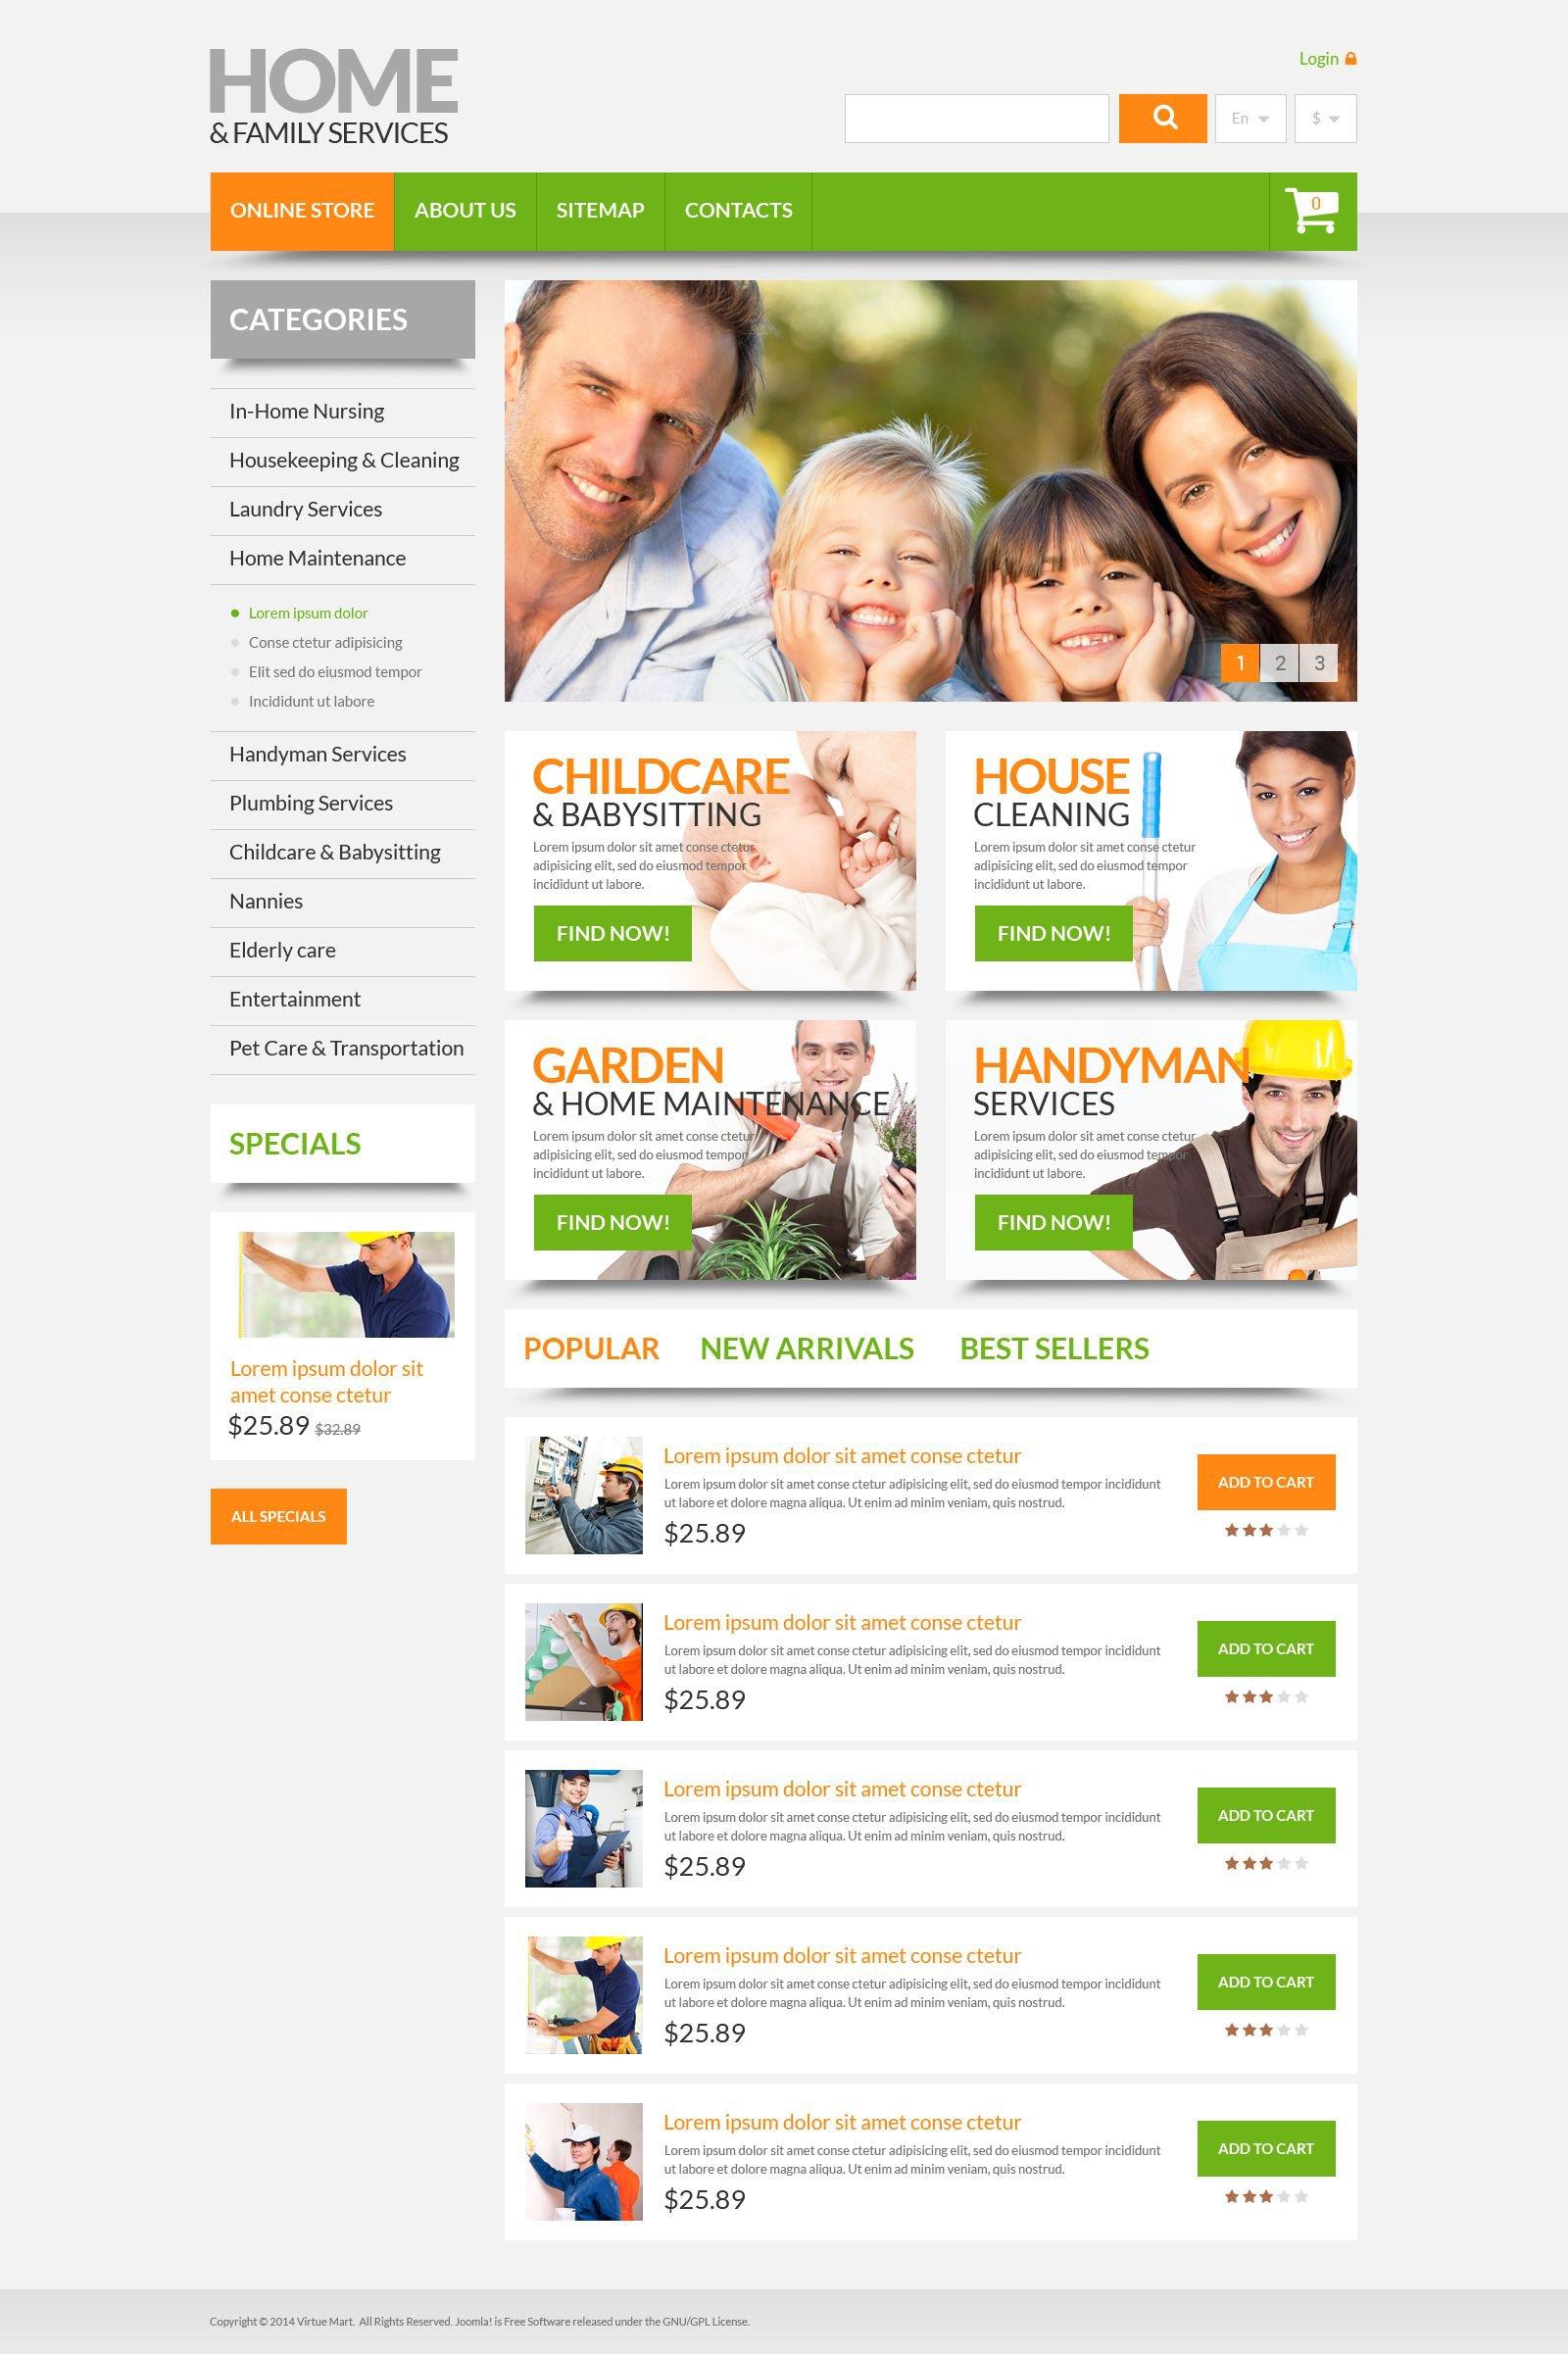 Home & Family Services PrestaShop Theme